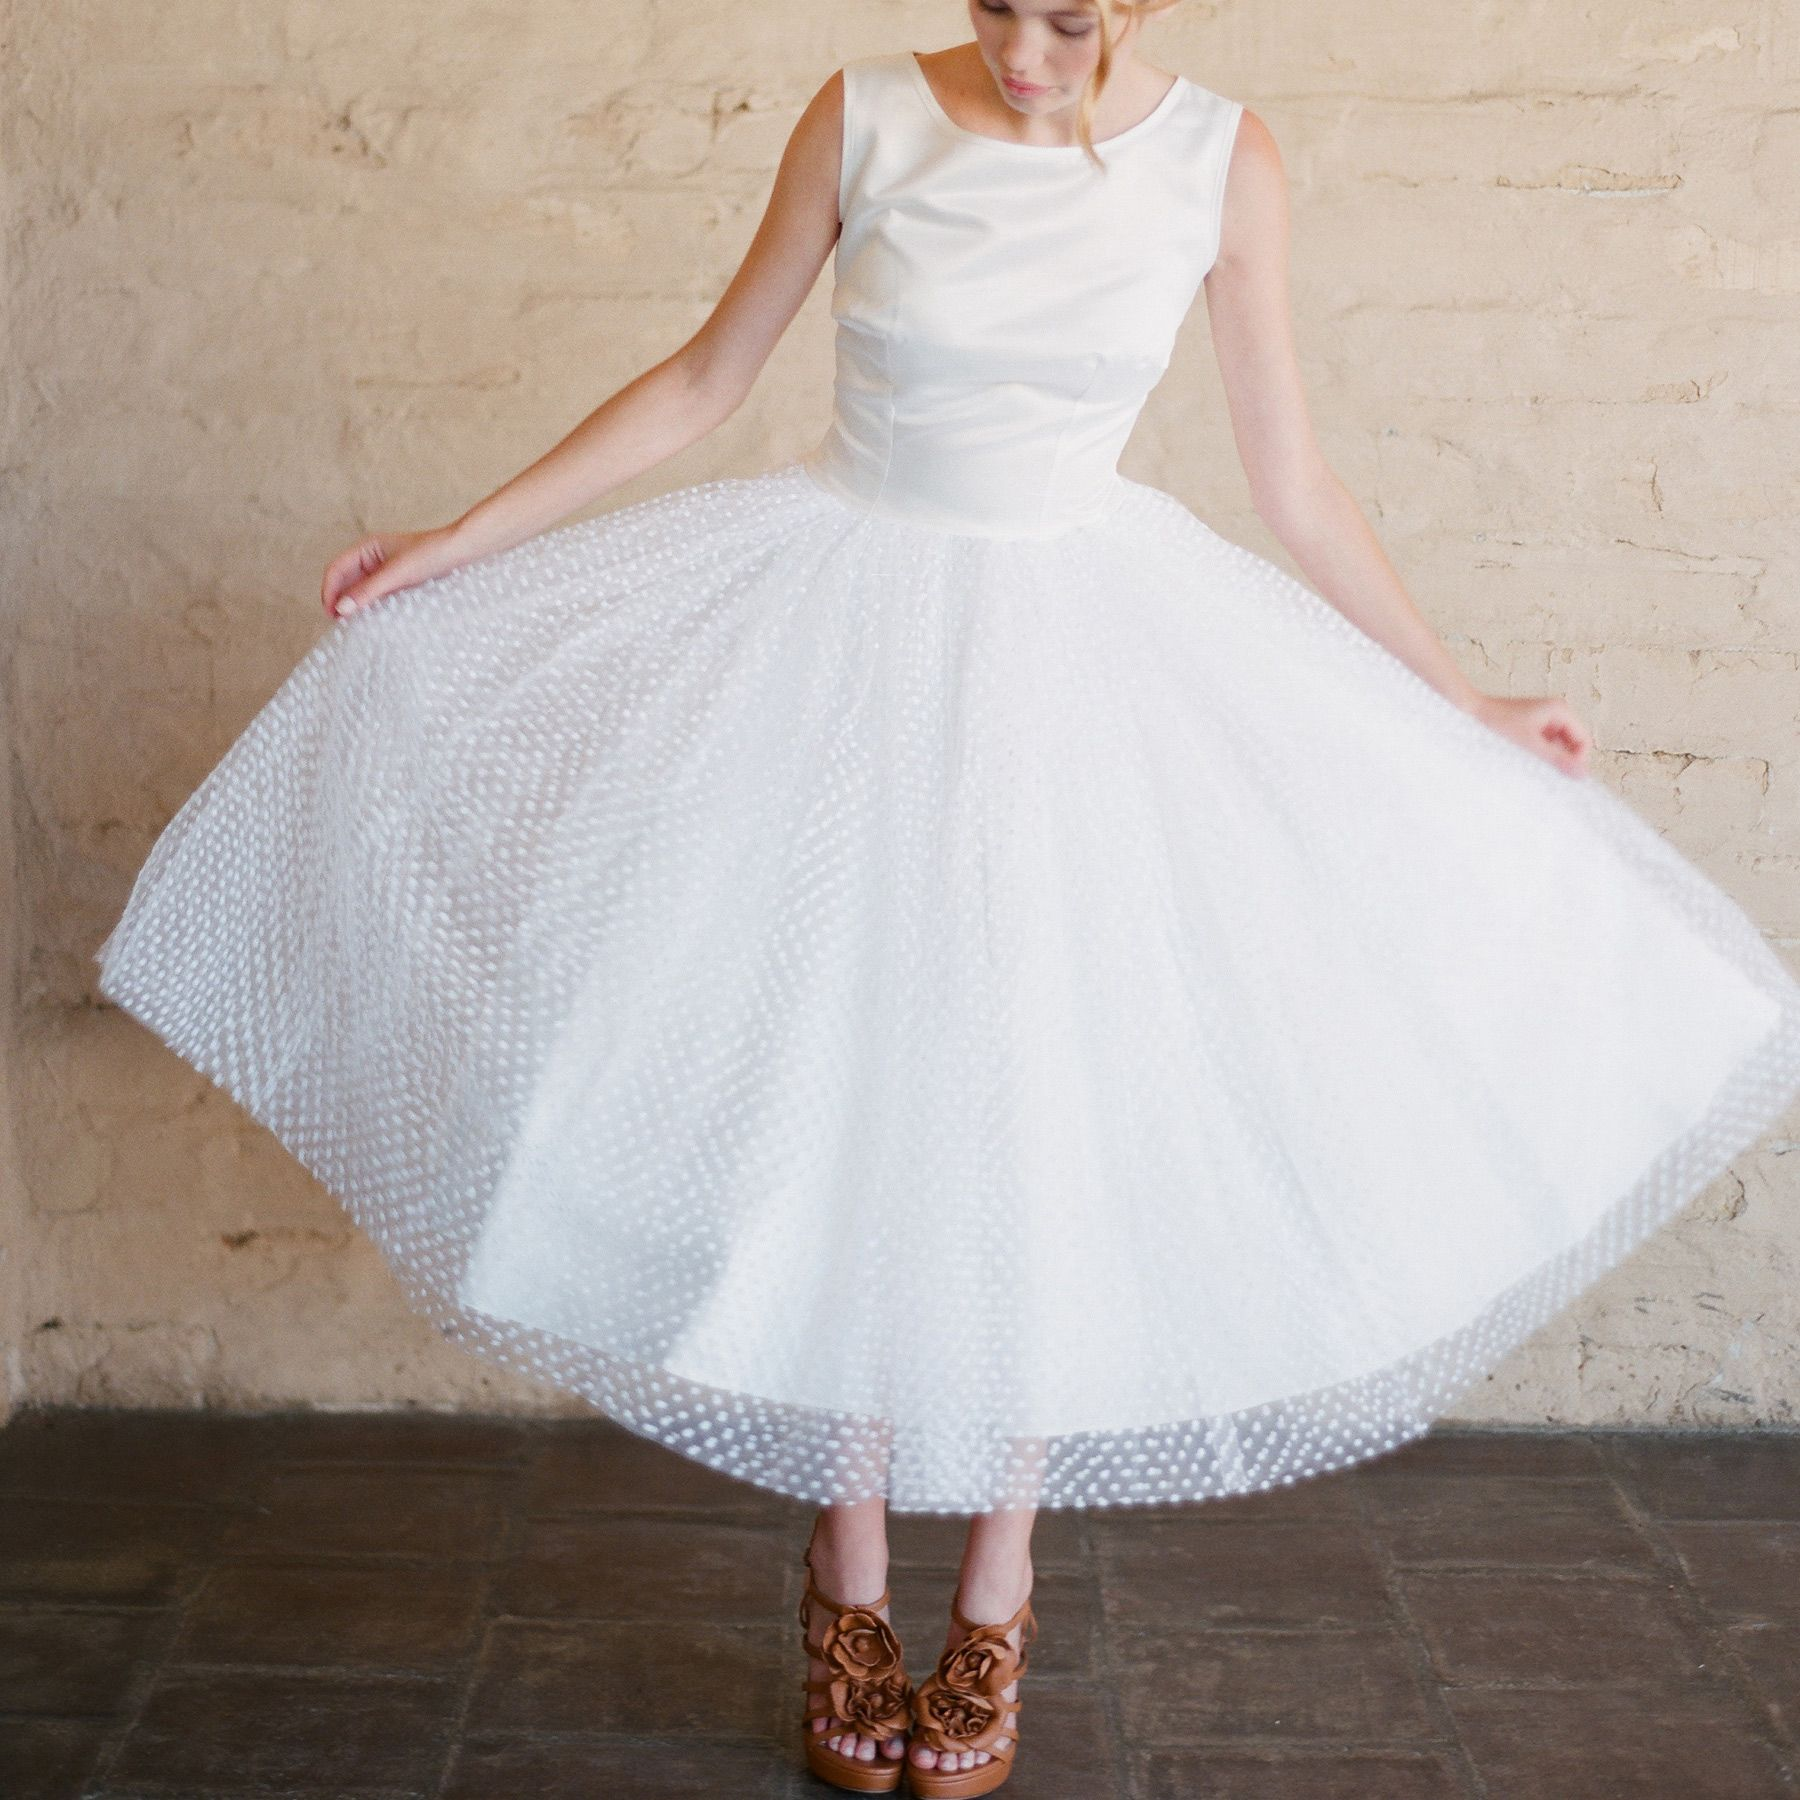 Daryl gown polka dot tulle wedding dress style pinterest tea